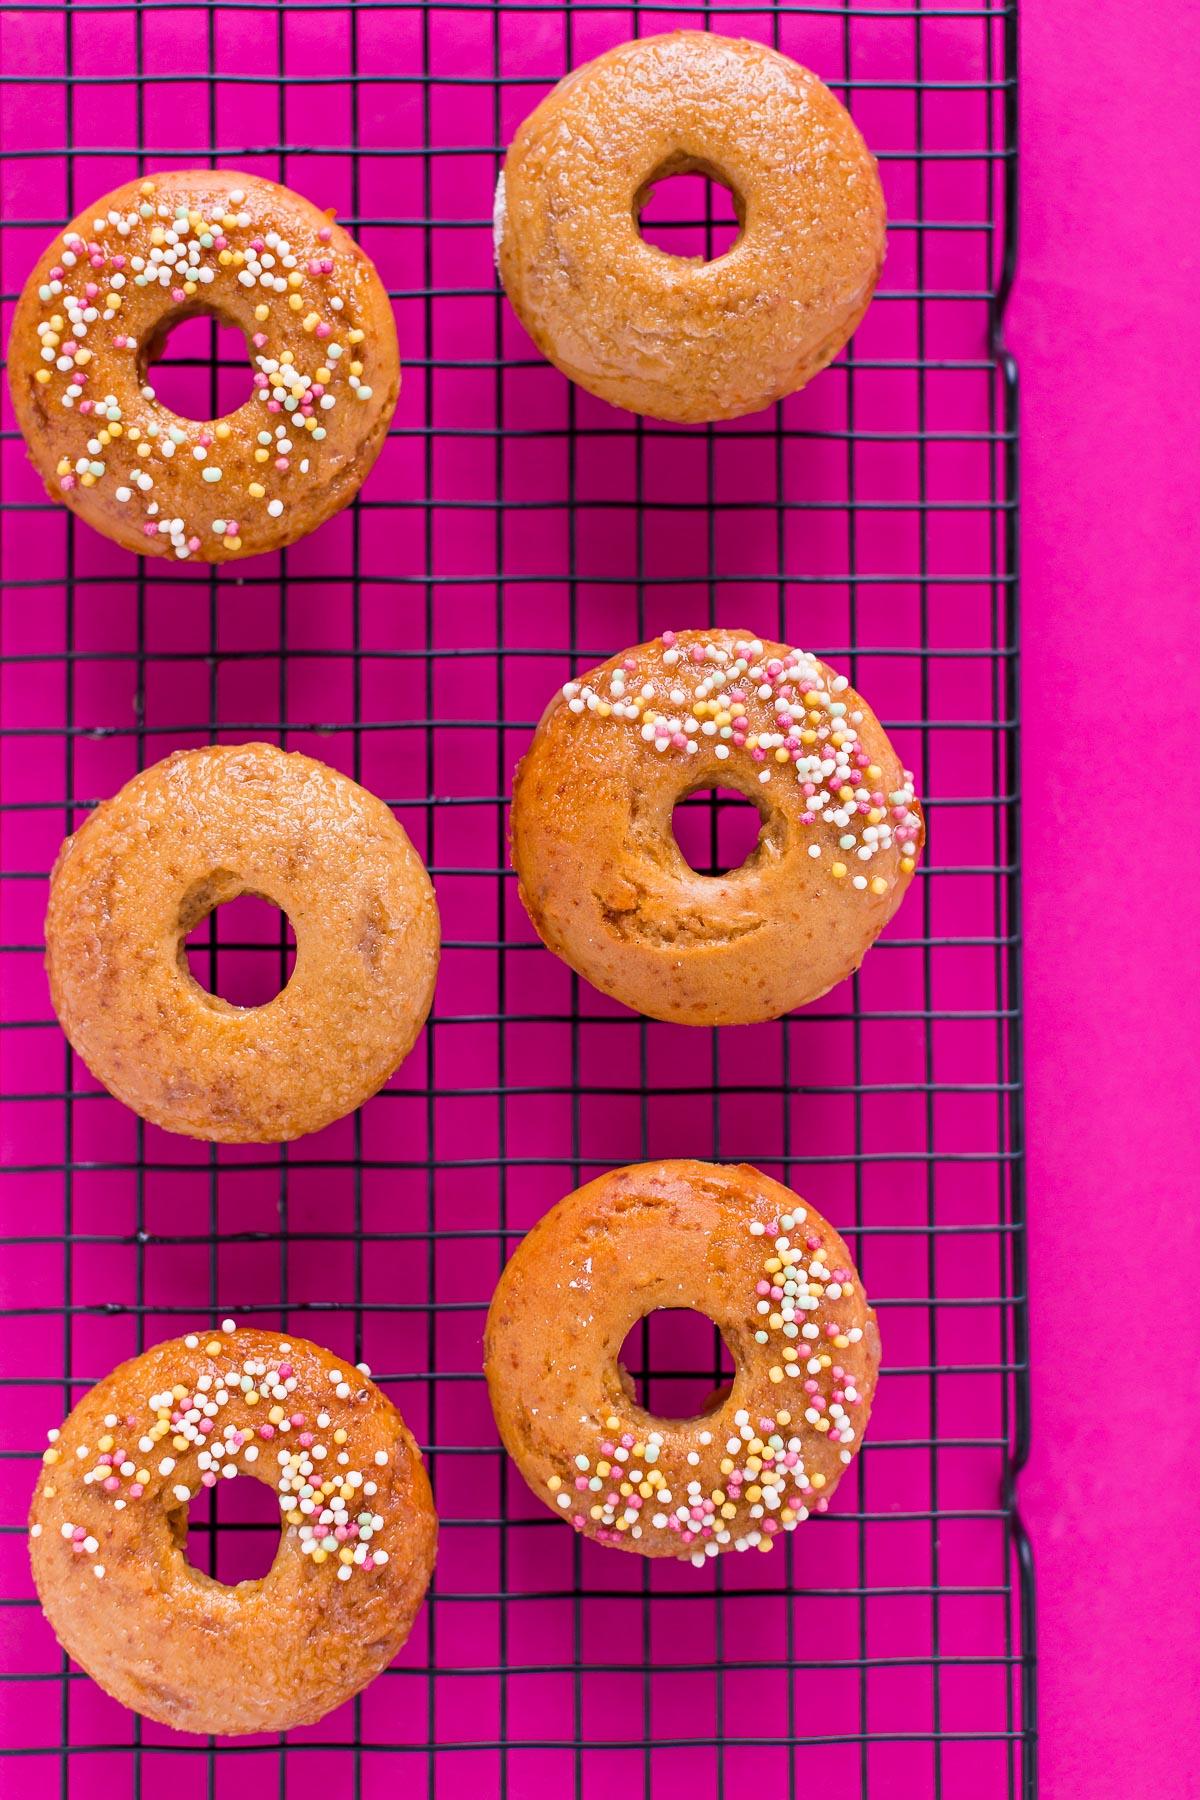 ricetta donuts al forno vegan senza glutine vegan glutenfree baked donuts recipe